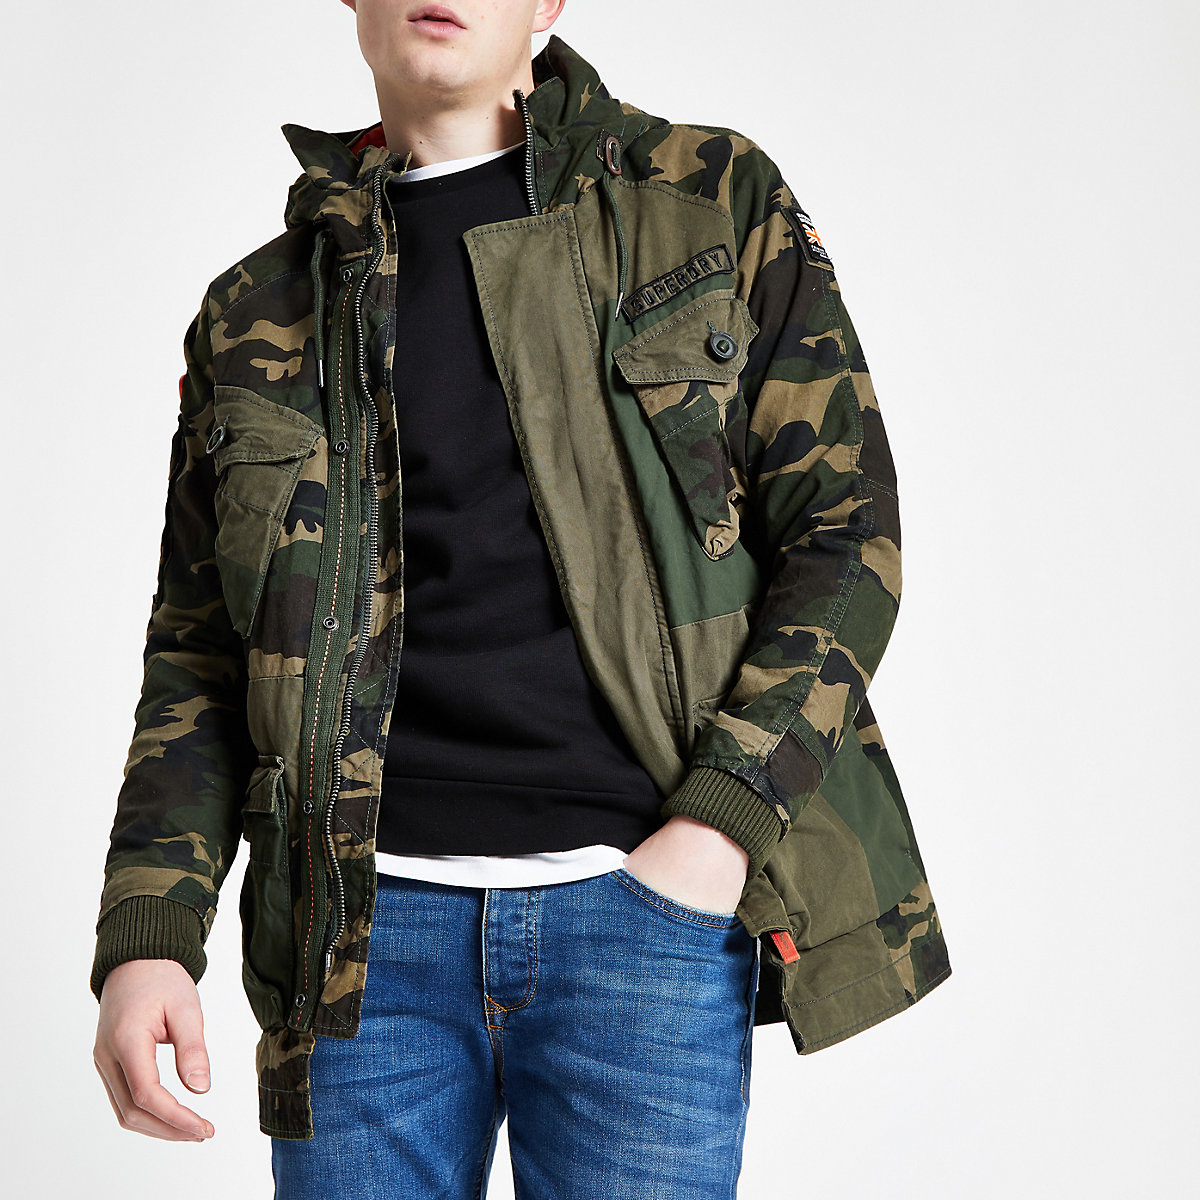 Superdry green camo parka jacket